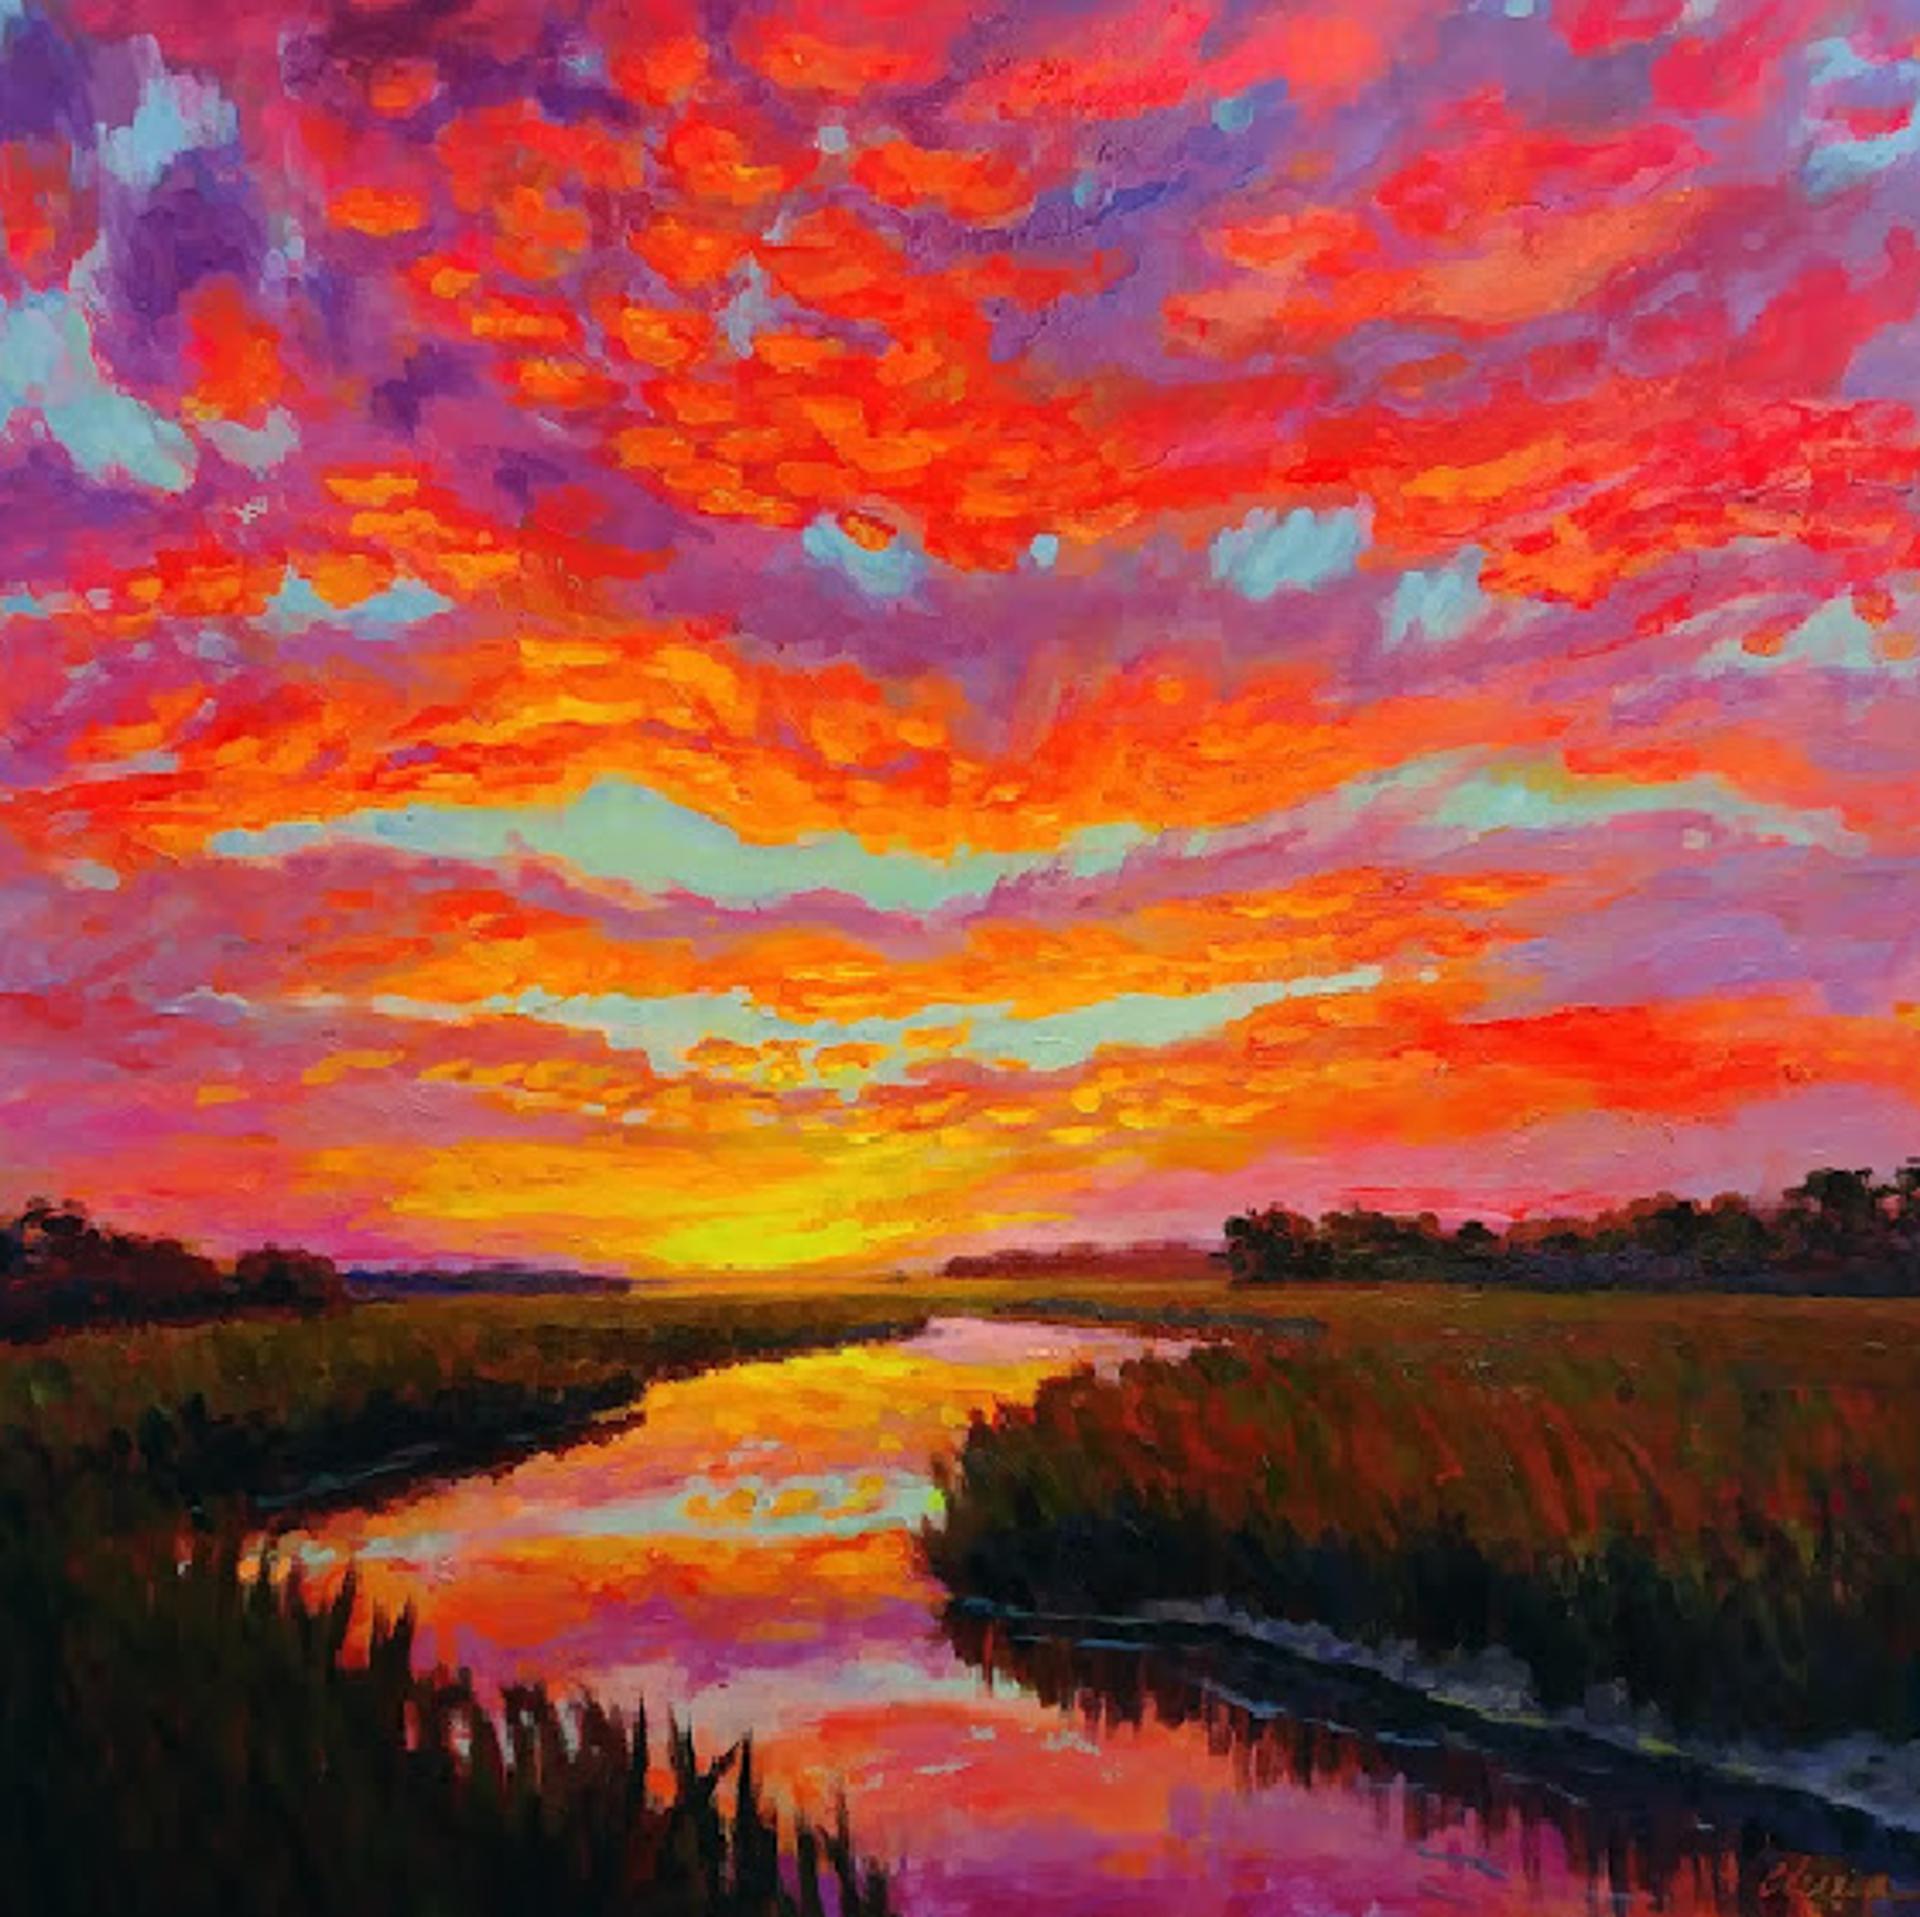 Carolina Sunset by Olessia Maximenko